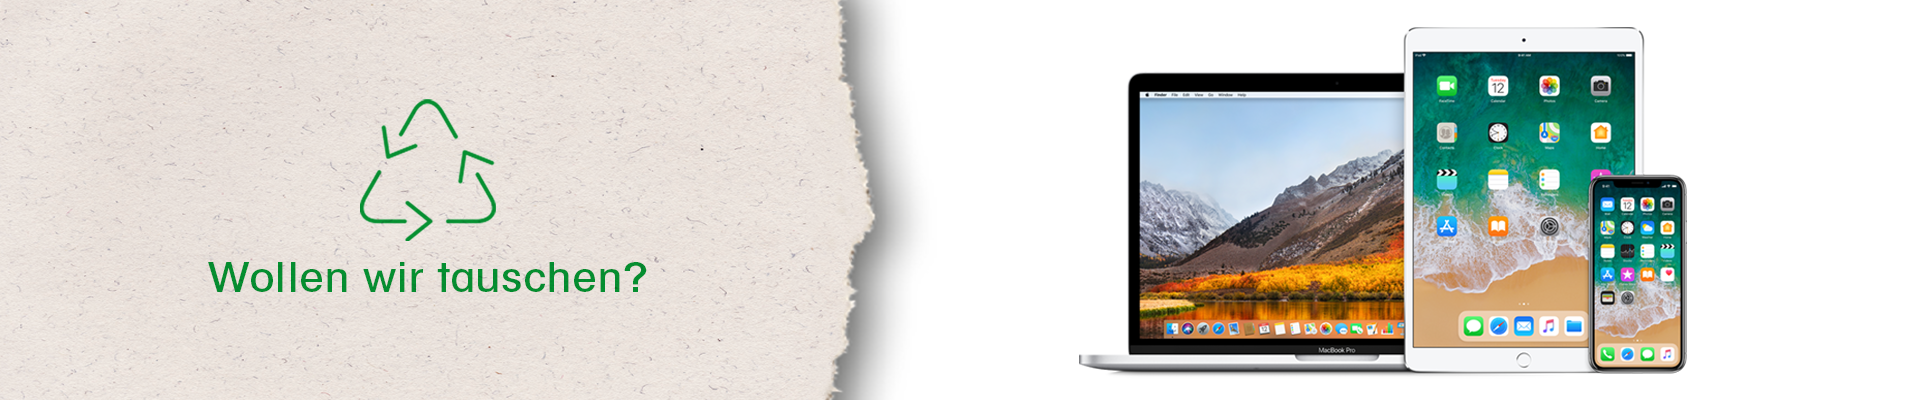 "MacBook Pro 13"" Touch Bar (2017)"